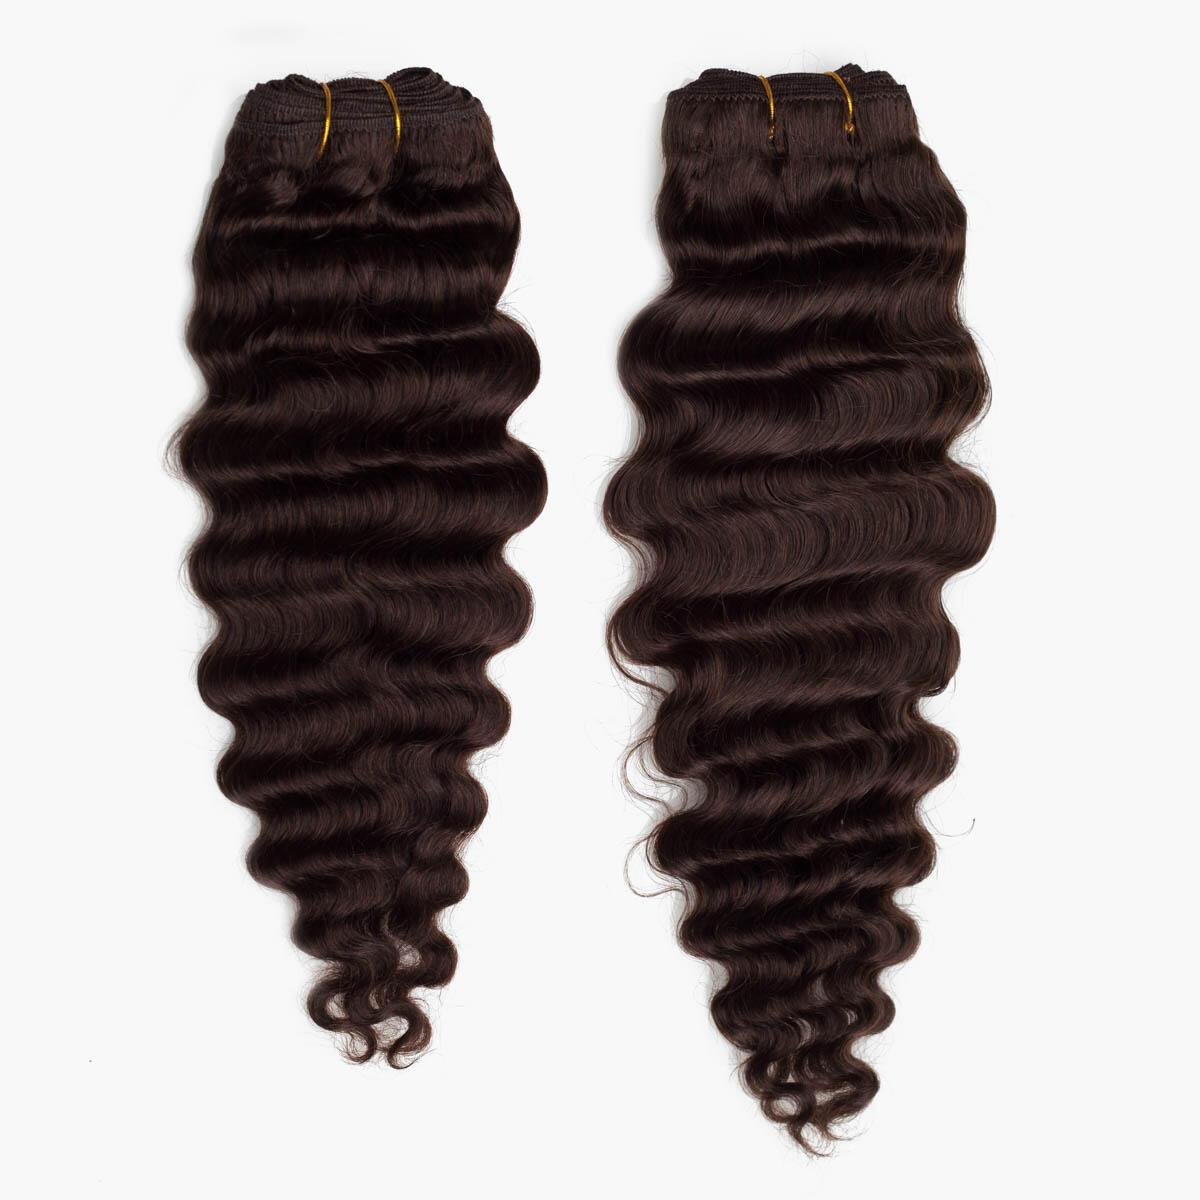 Hair Weft Soft Wave 2.2 Coffee Brown 40 cm